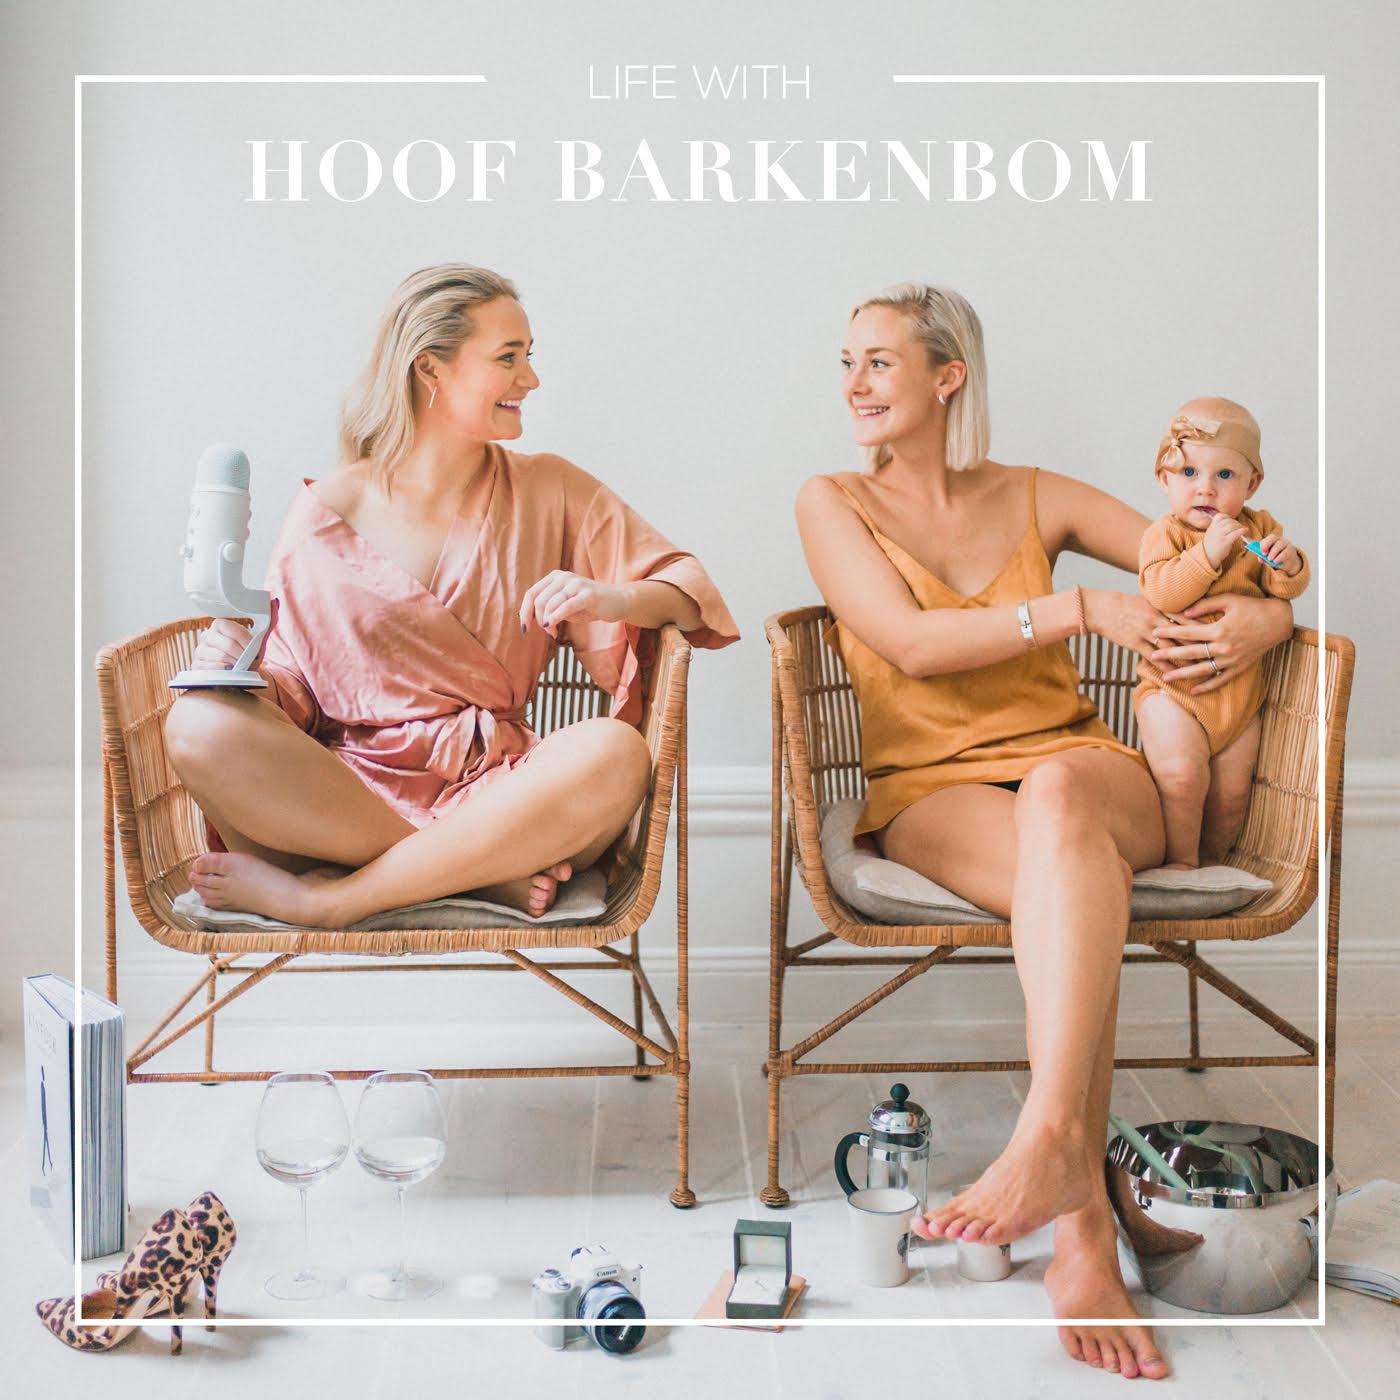 Life with Hoof Barkenbom